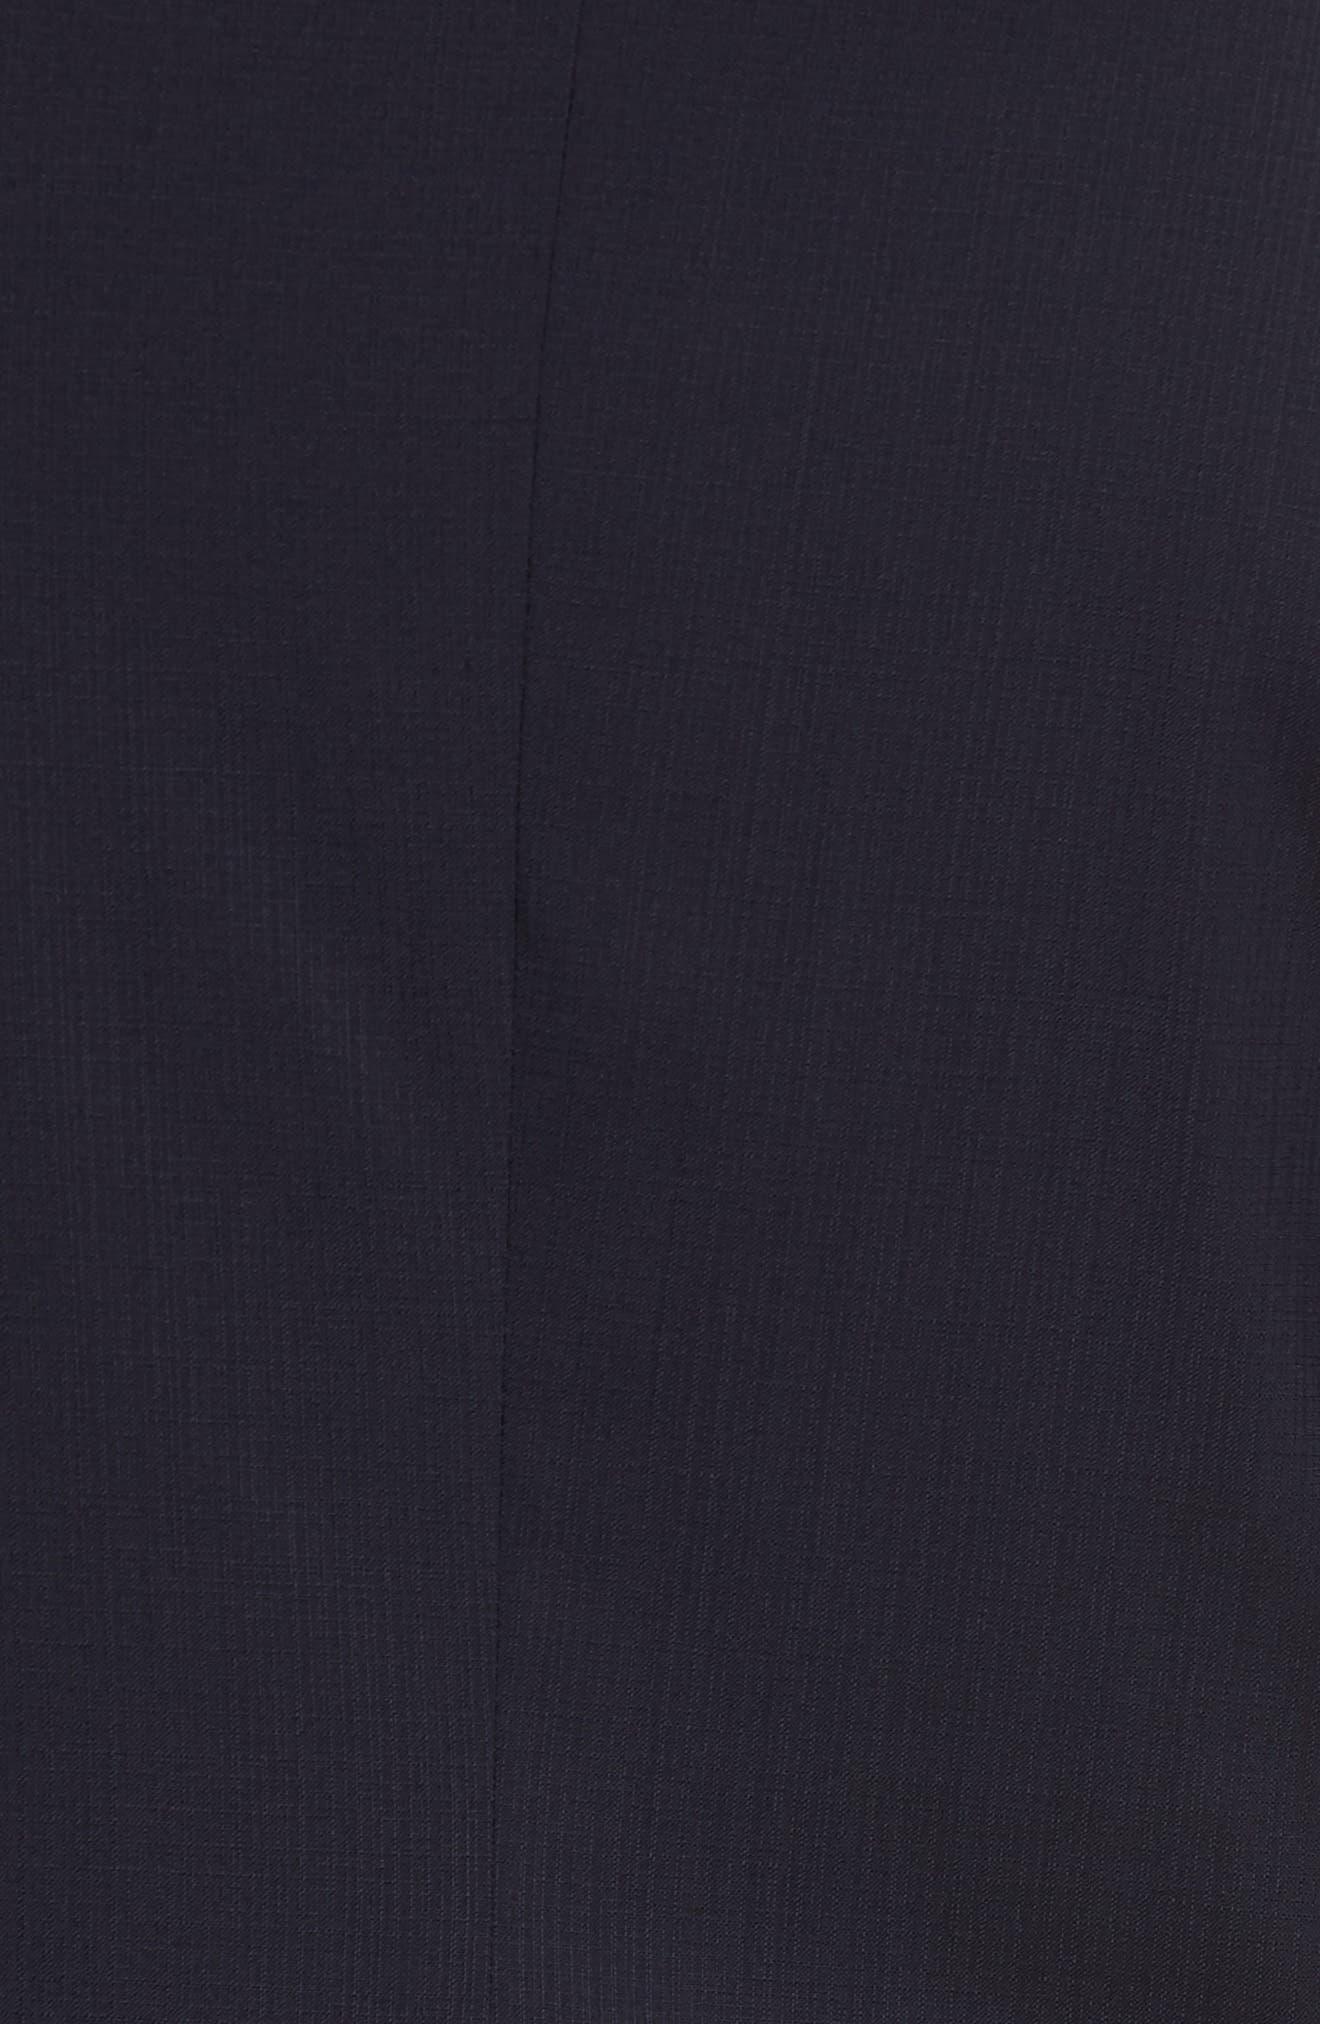 Classic Fit Check Suit,                             Alternate thumbnail 7, color,                             Navy